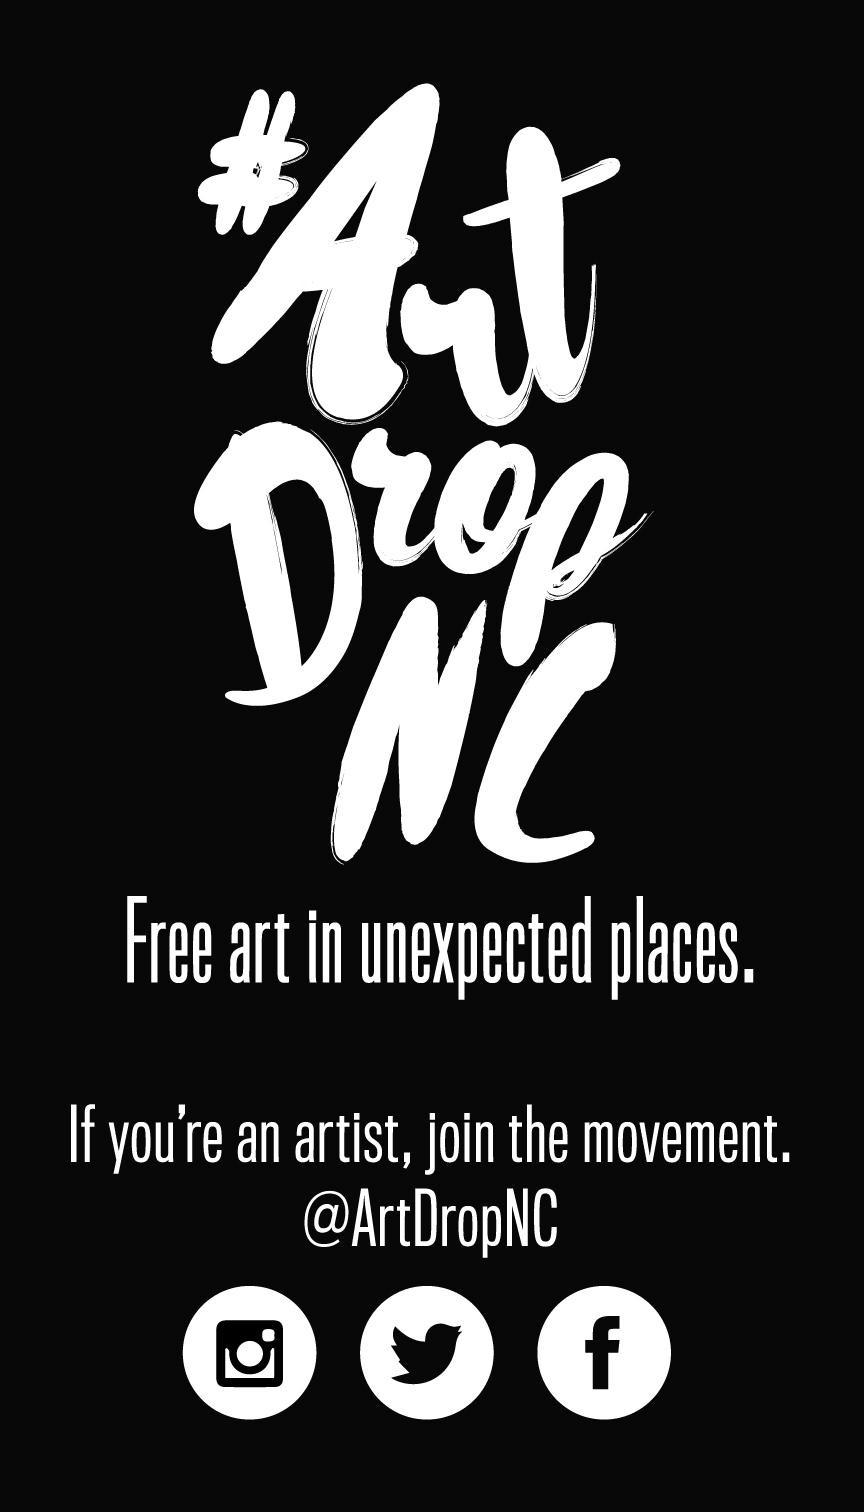 #ArtDropNC